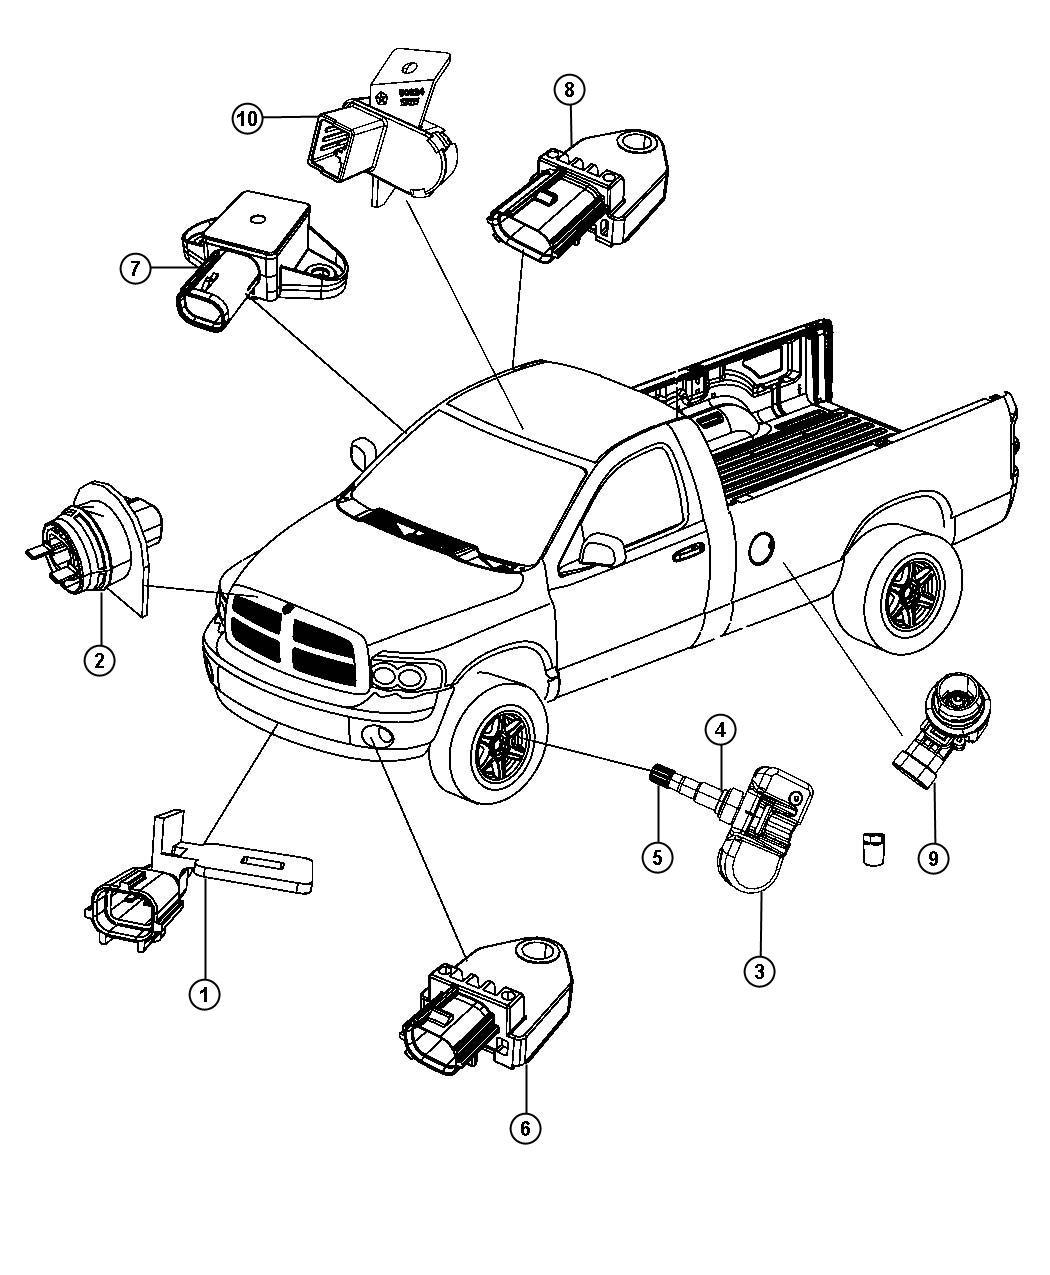 2009 jeep liberty sky slider parts diagram  u2022 wiring